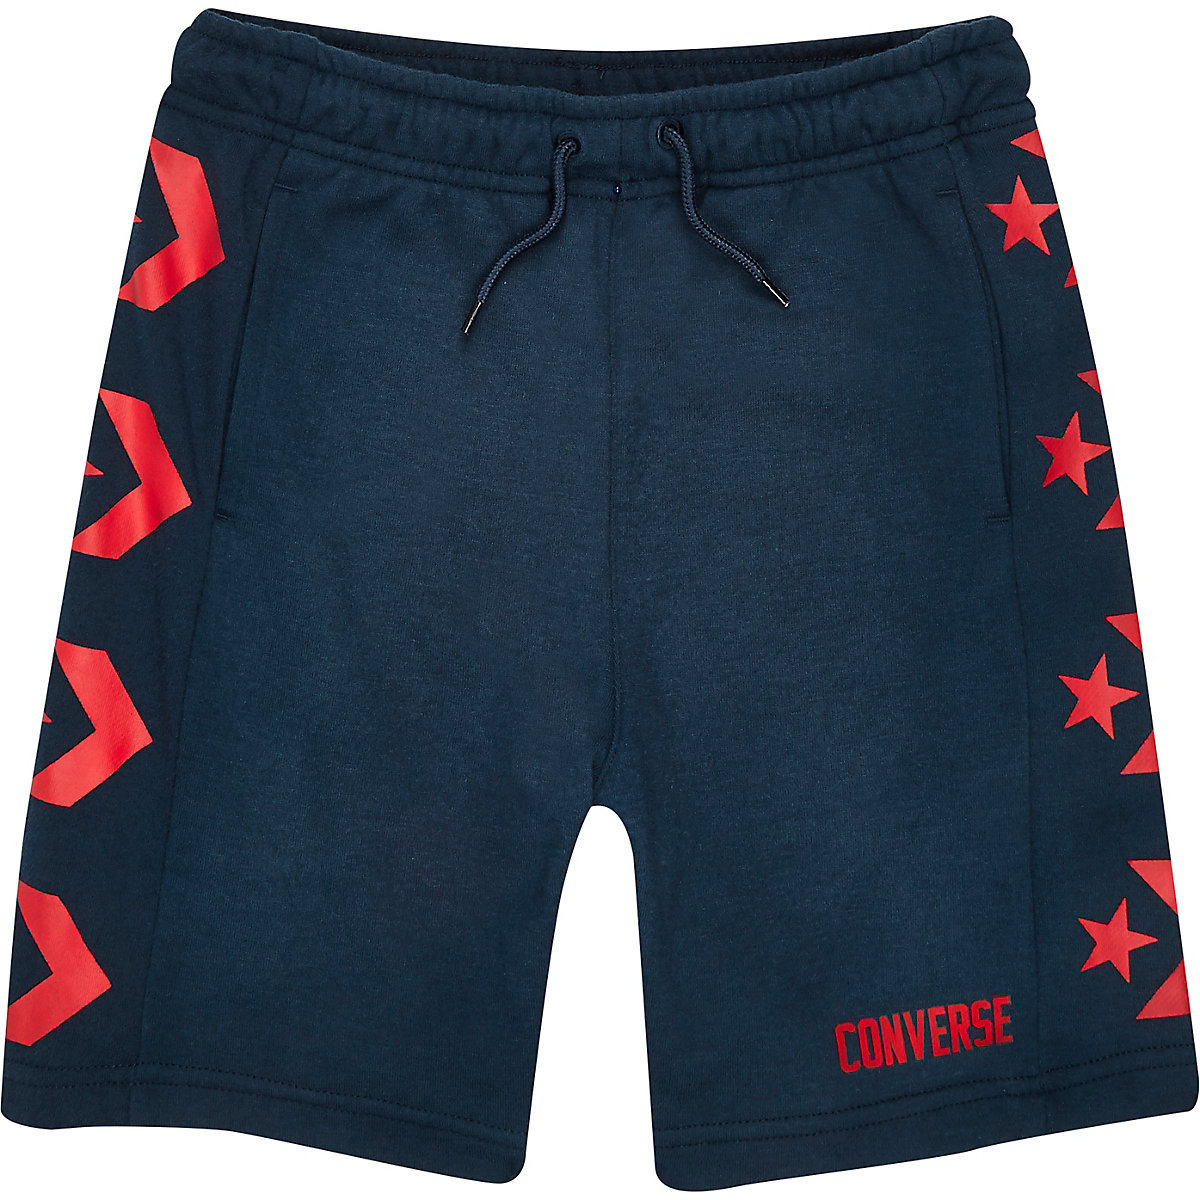 Boys navy Converse logo jersey shorts